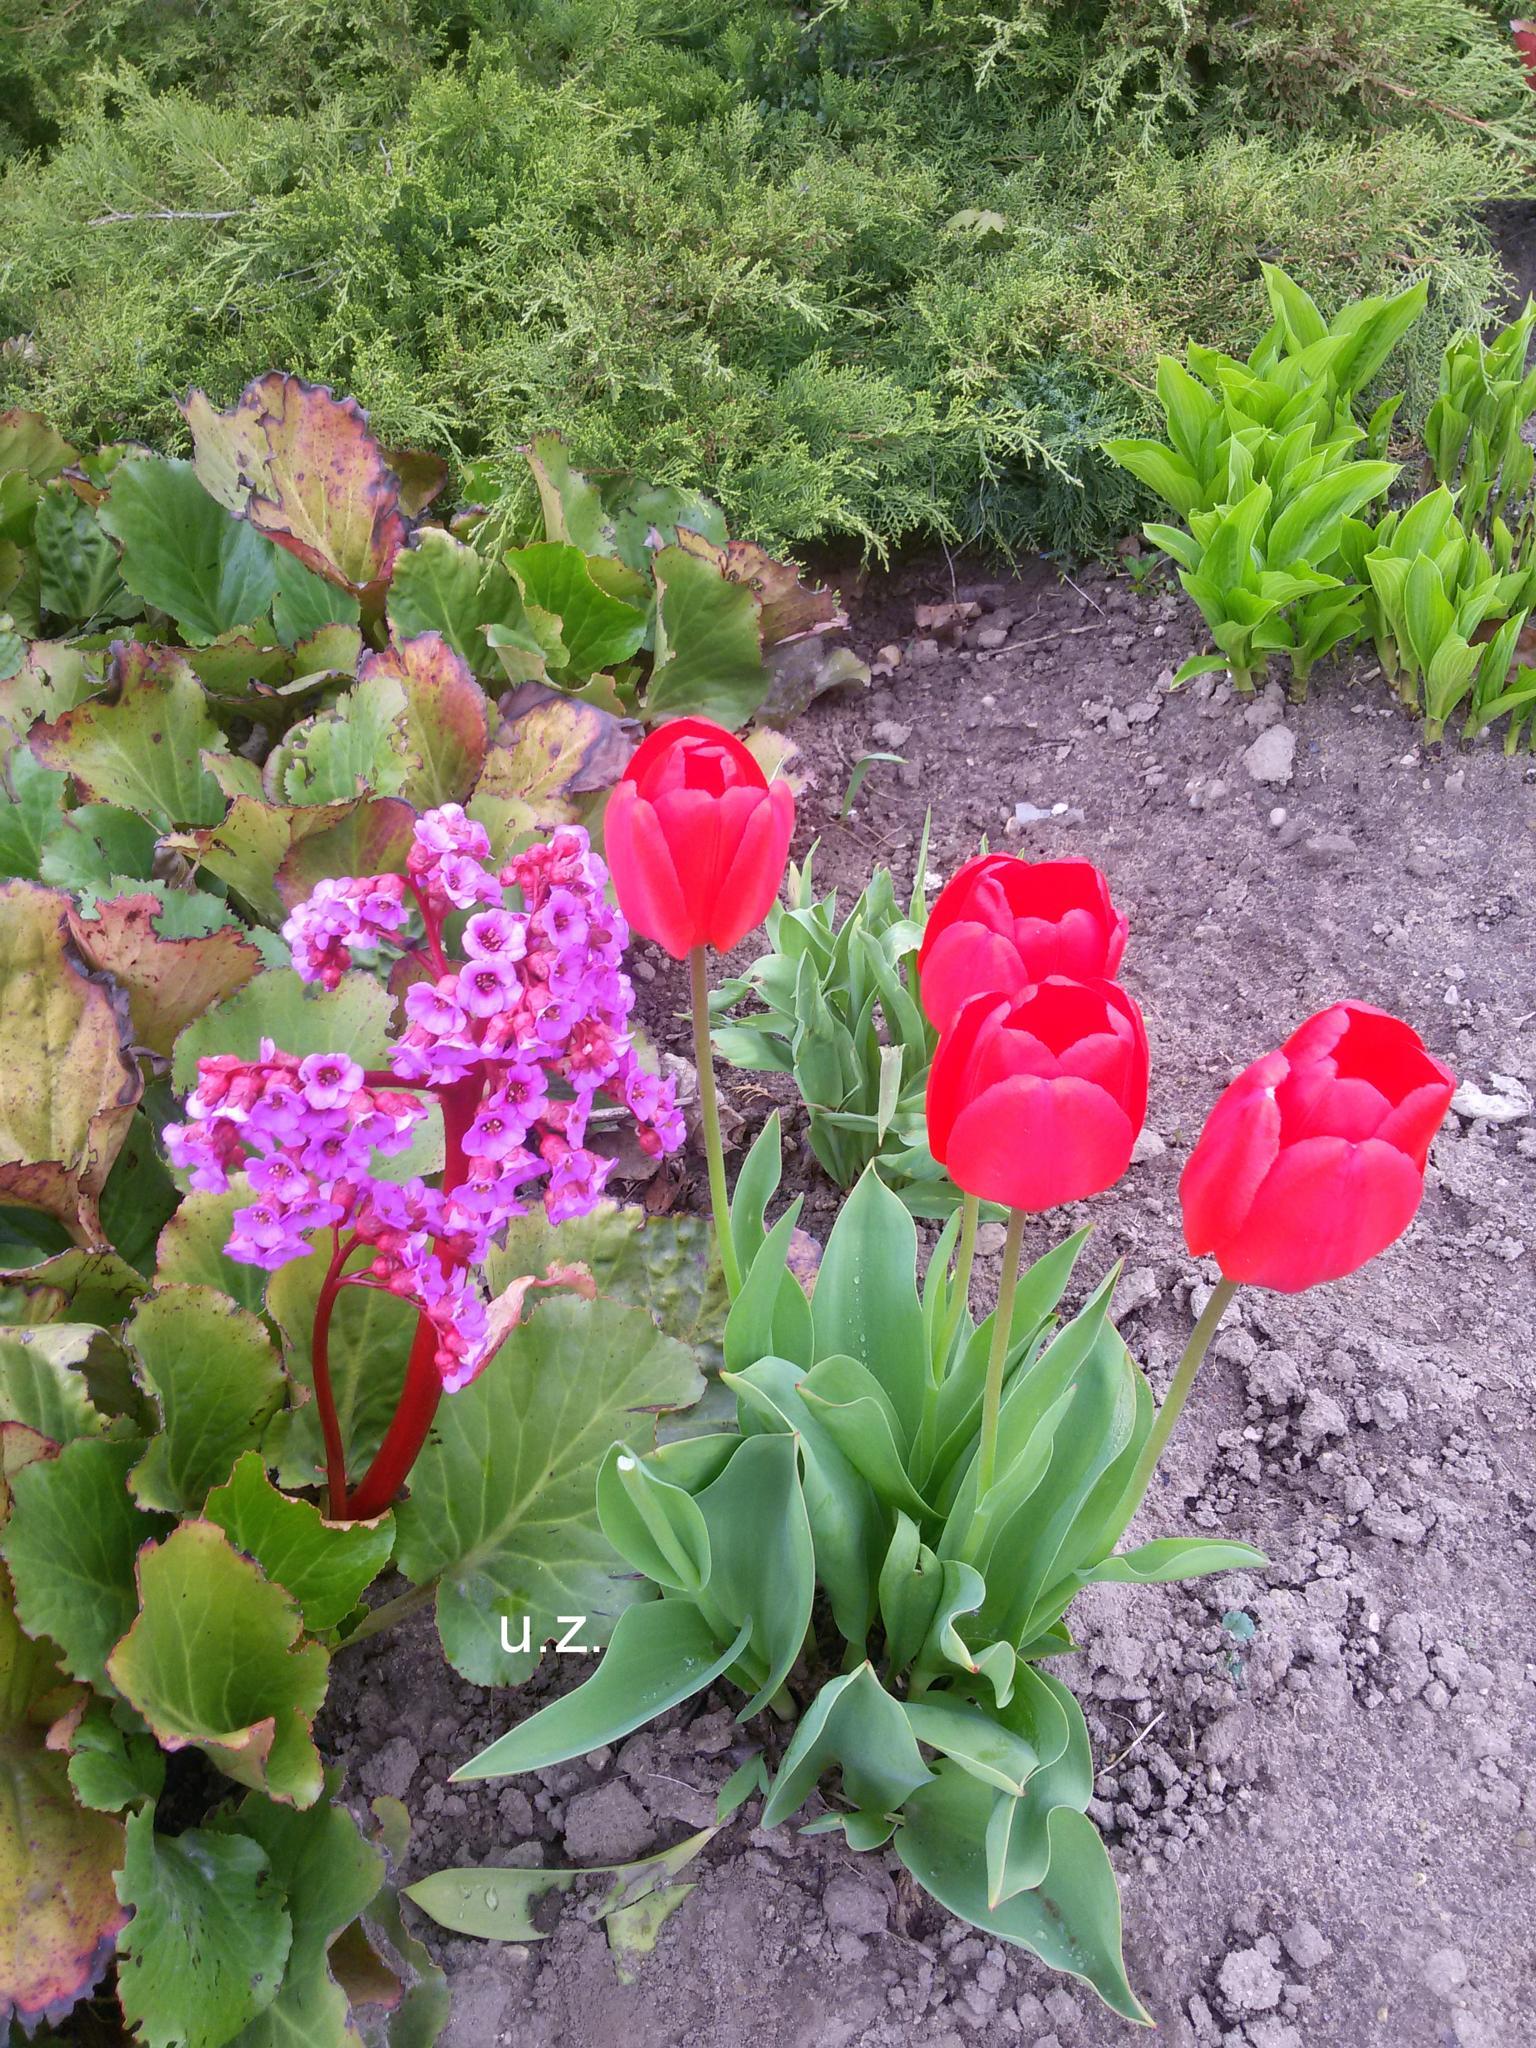 Flower garden by Zita Užkuraitienė